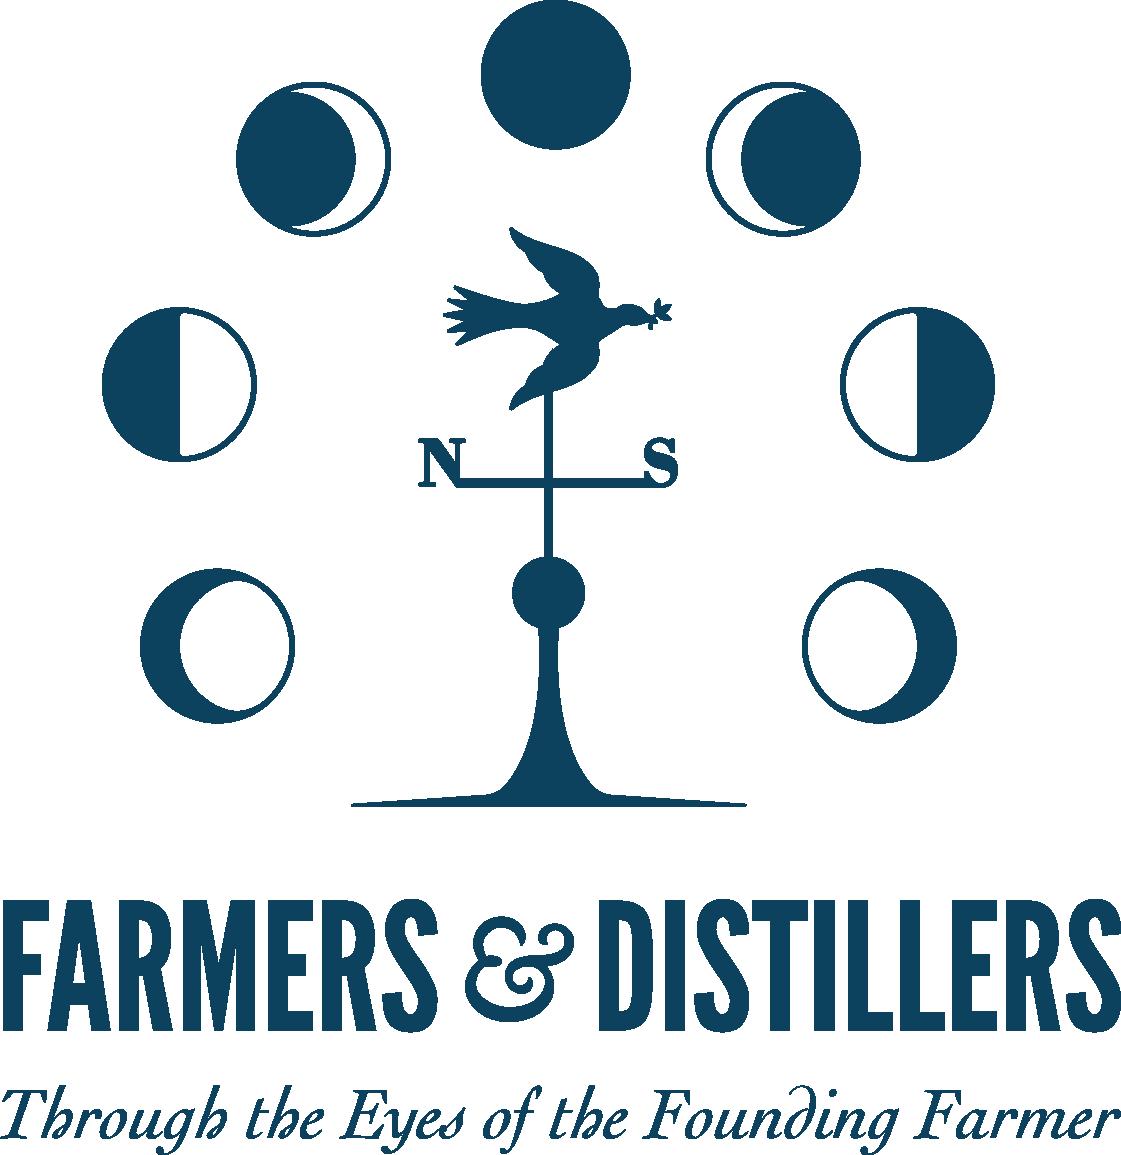 FarmersAndDistillers_Logo_CMYK - Emily Sarecky.png